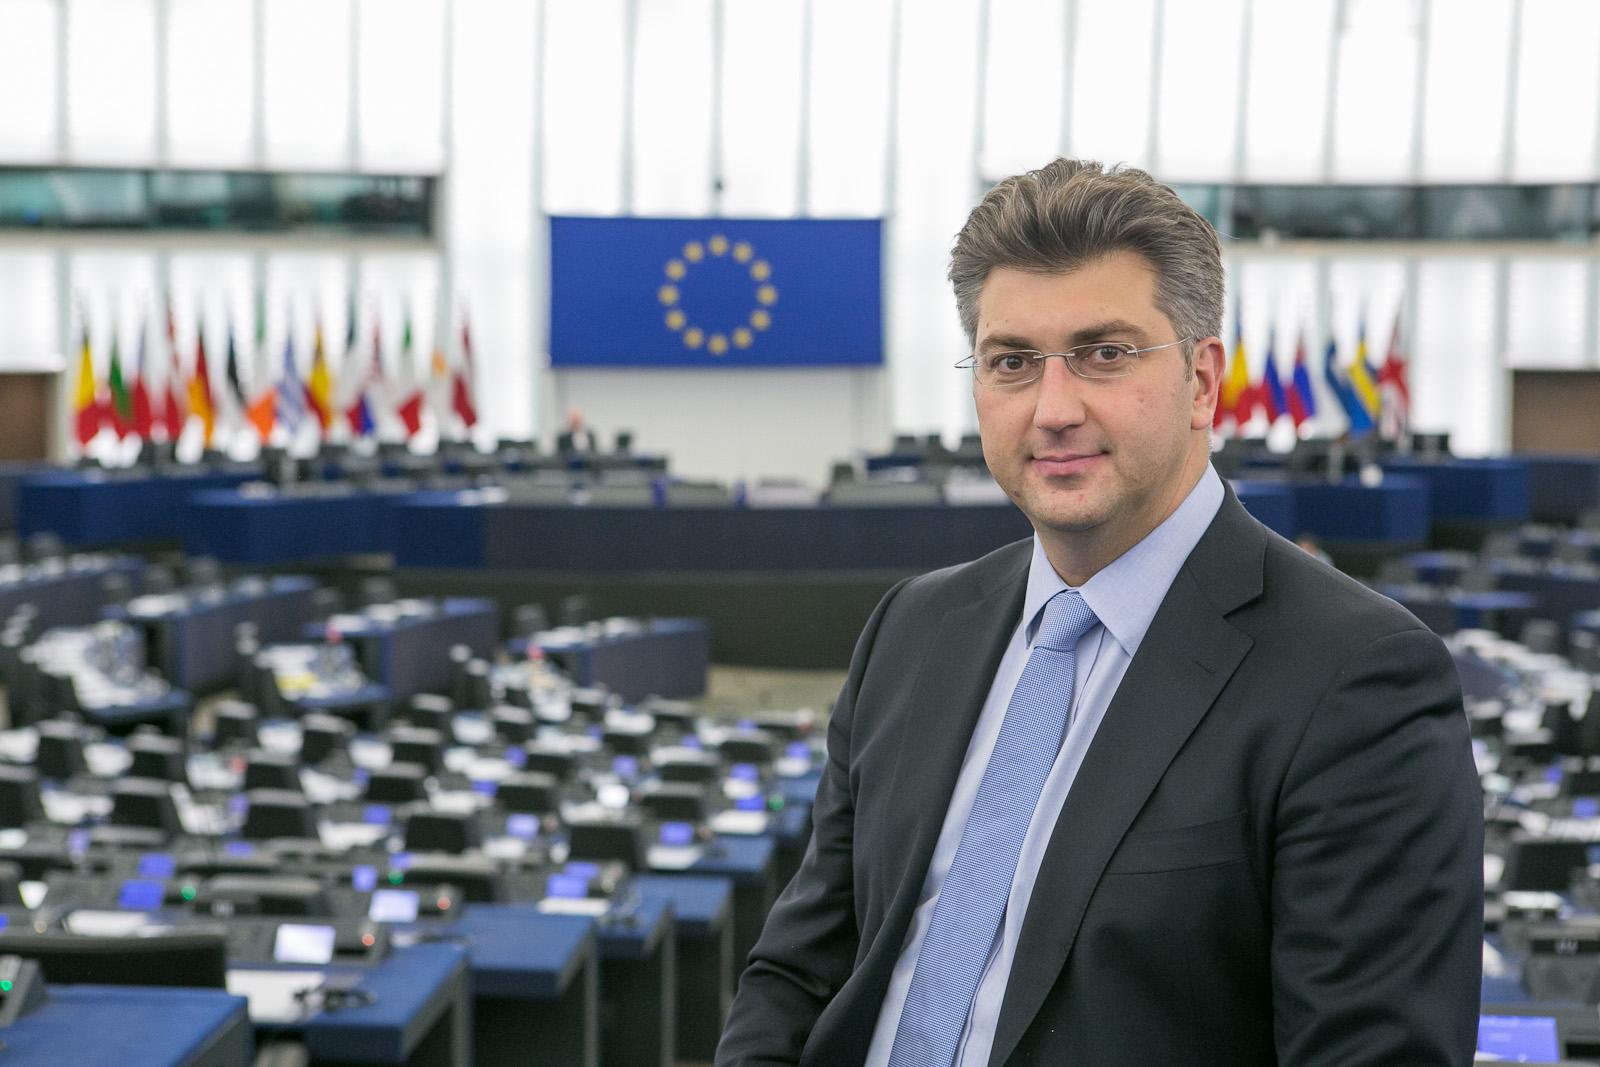 http://hrvatskifokus-2021.ga/wp-content/uploads/2016/09/www.euractiv.com_wp-content_uploads_sites_2_2016_07_Andrej-Plenkovic.jpg